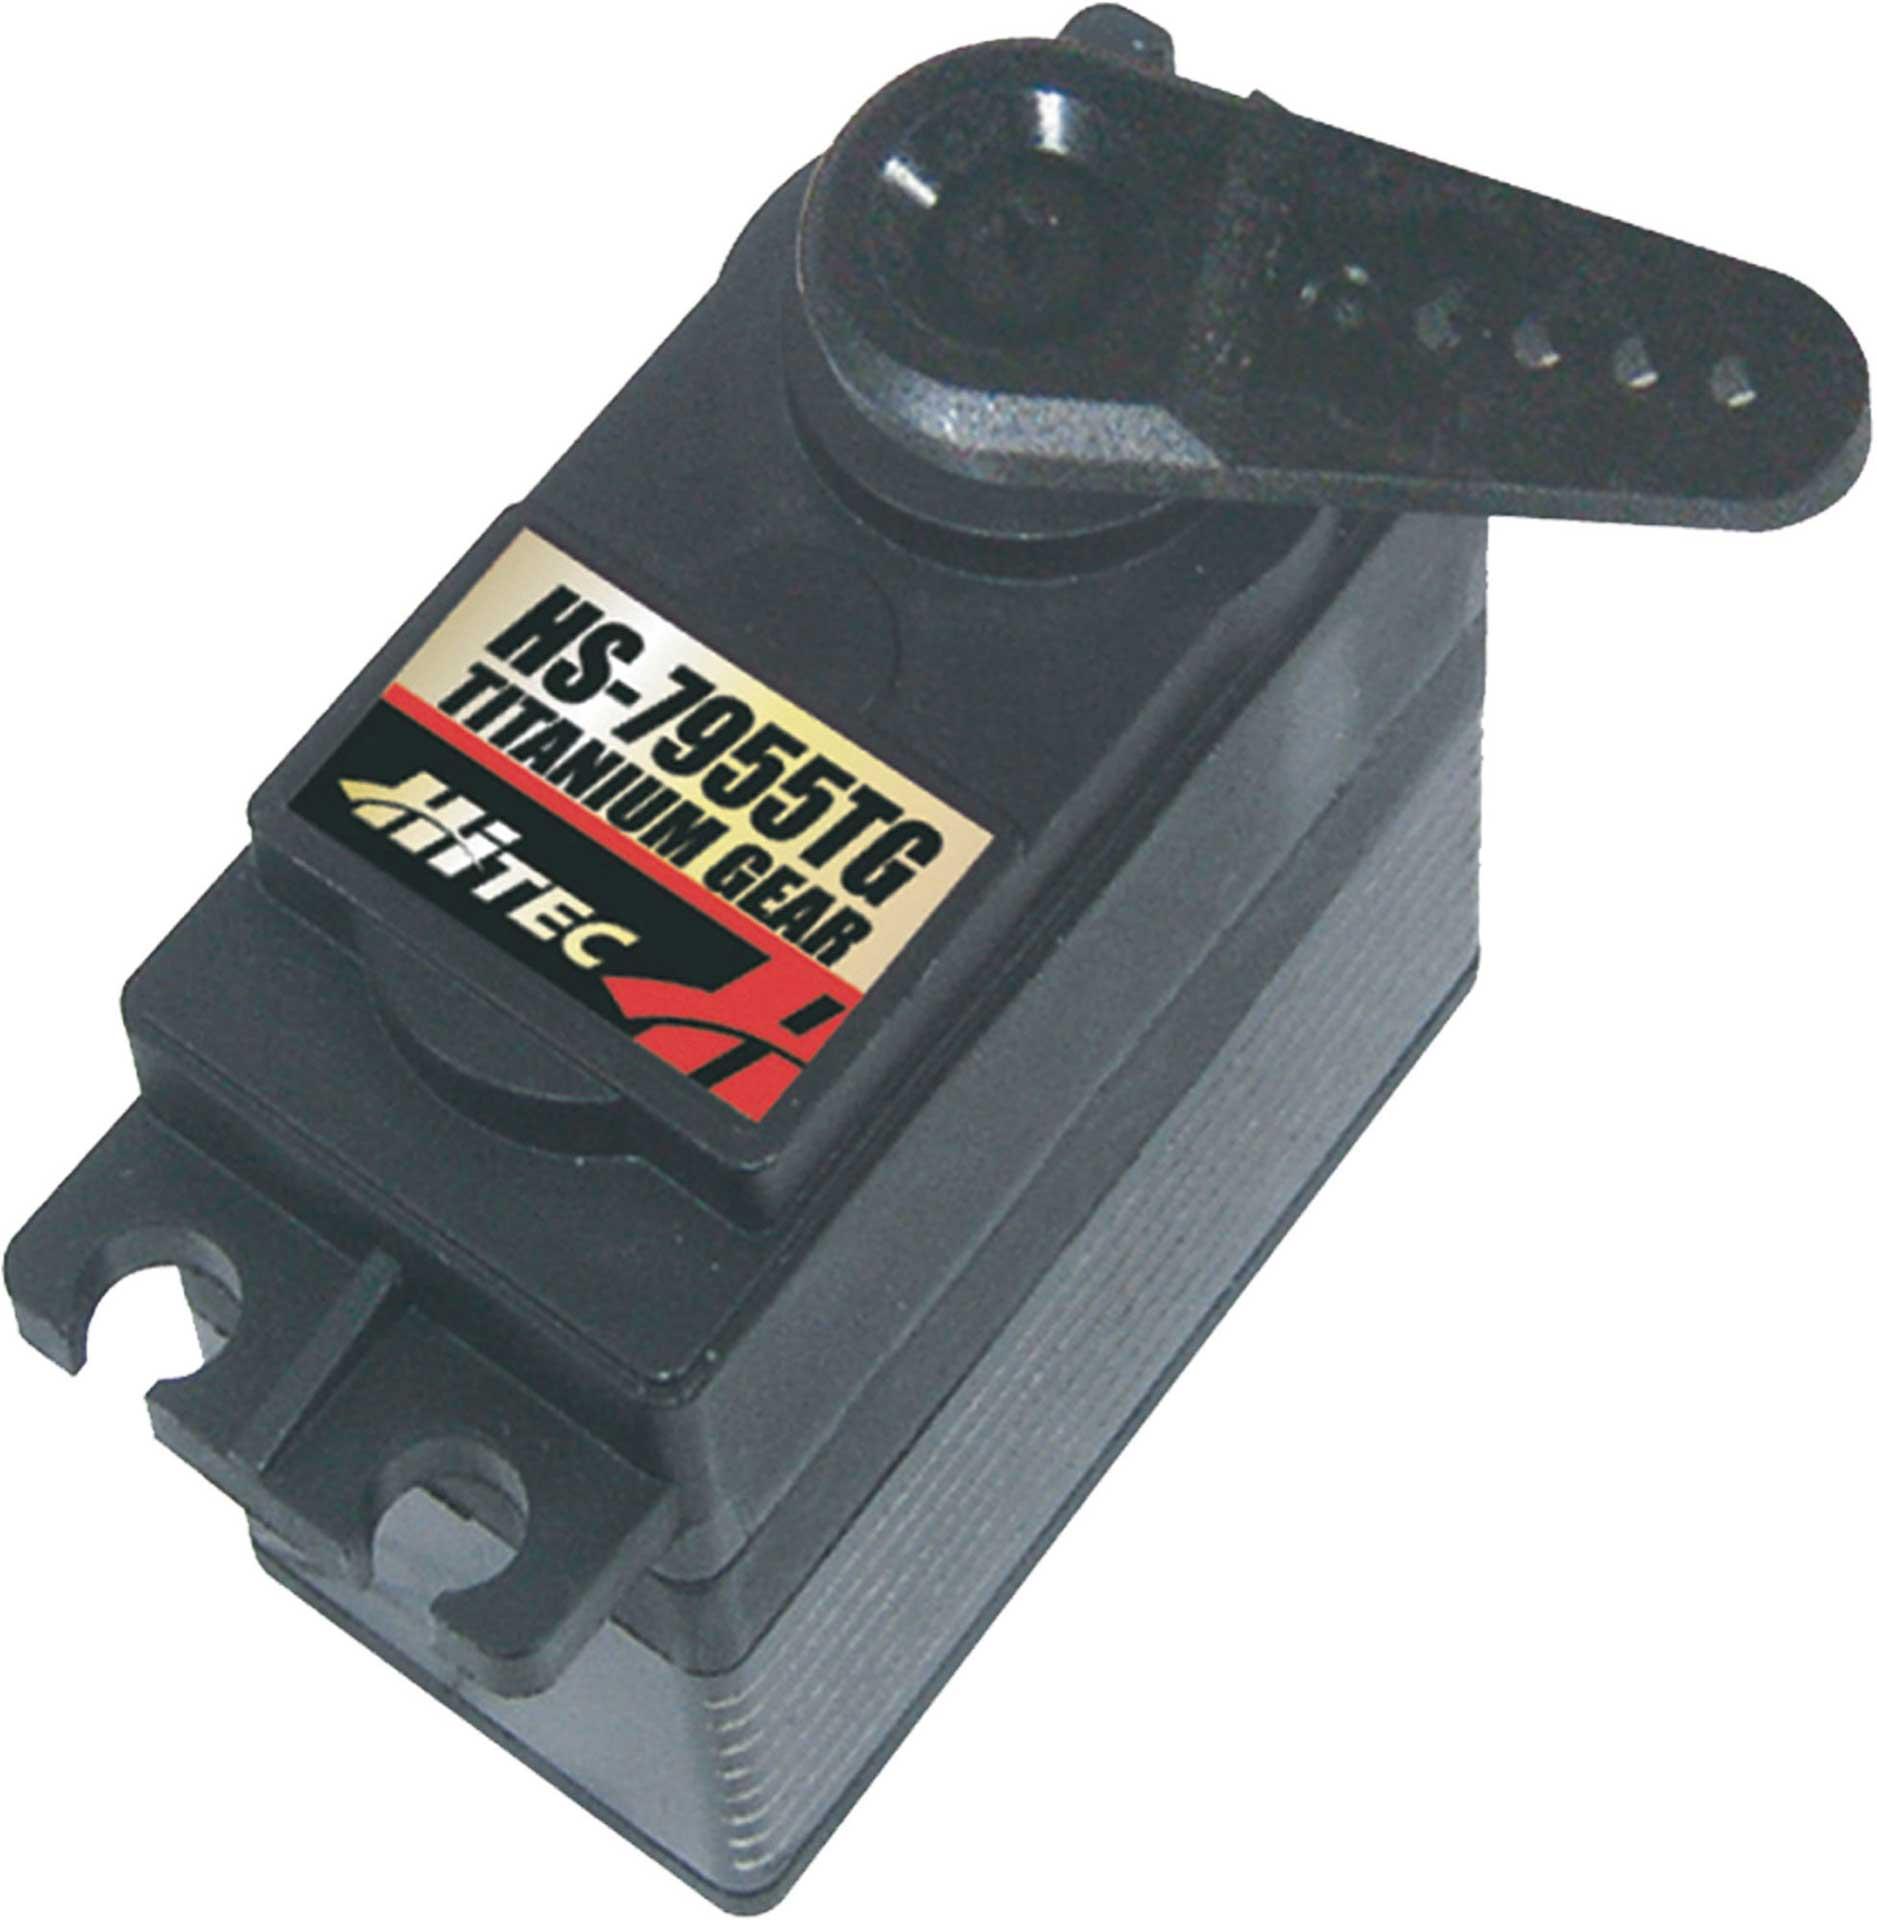 HITEC HS-7955 TG DIGITAL G2 UNI SERVO